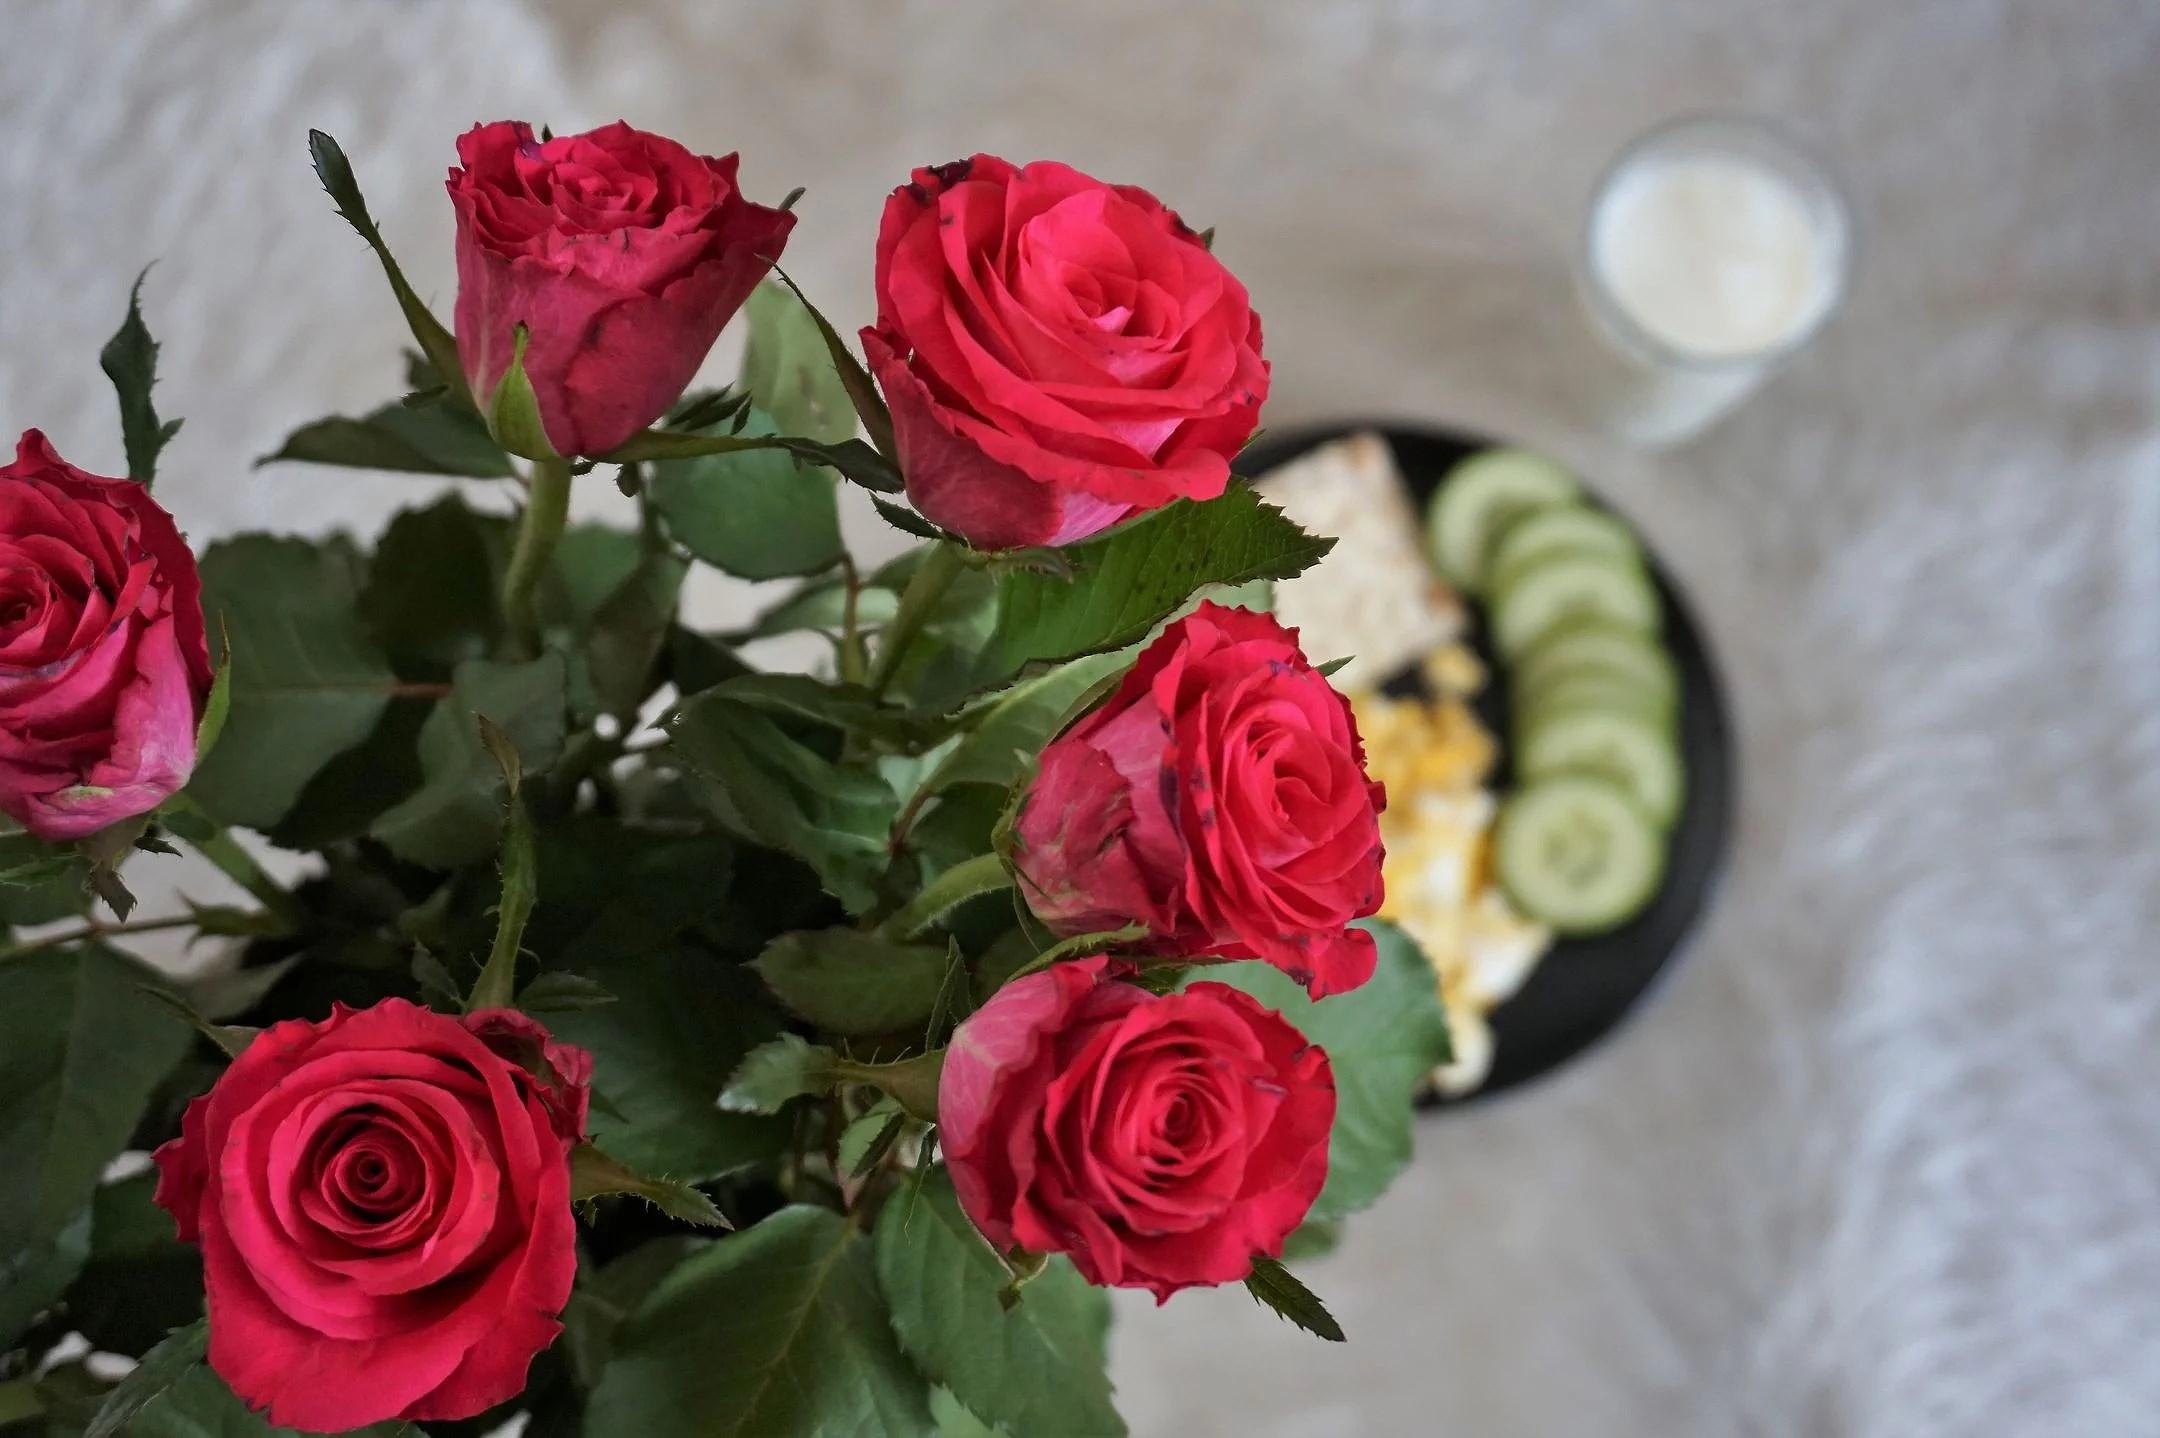 ROSES & BREAKFAST